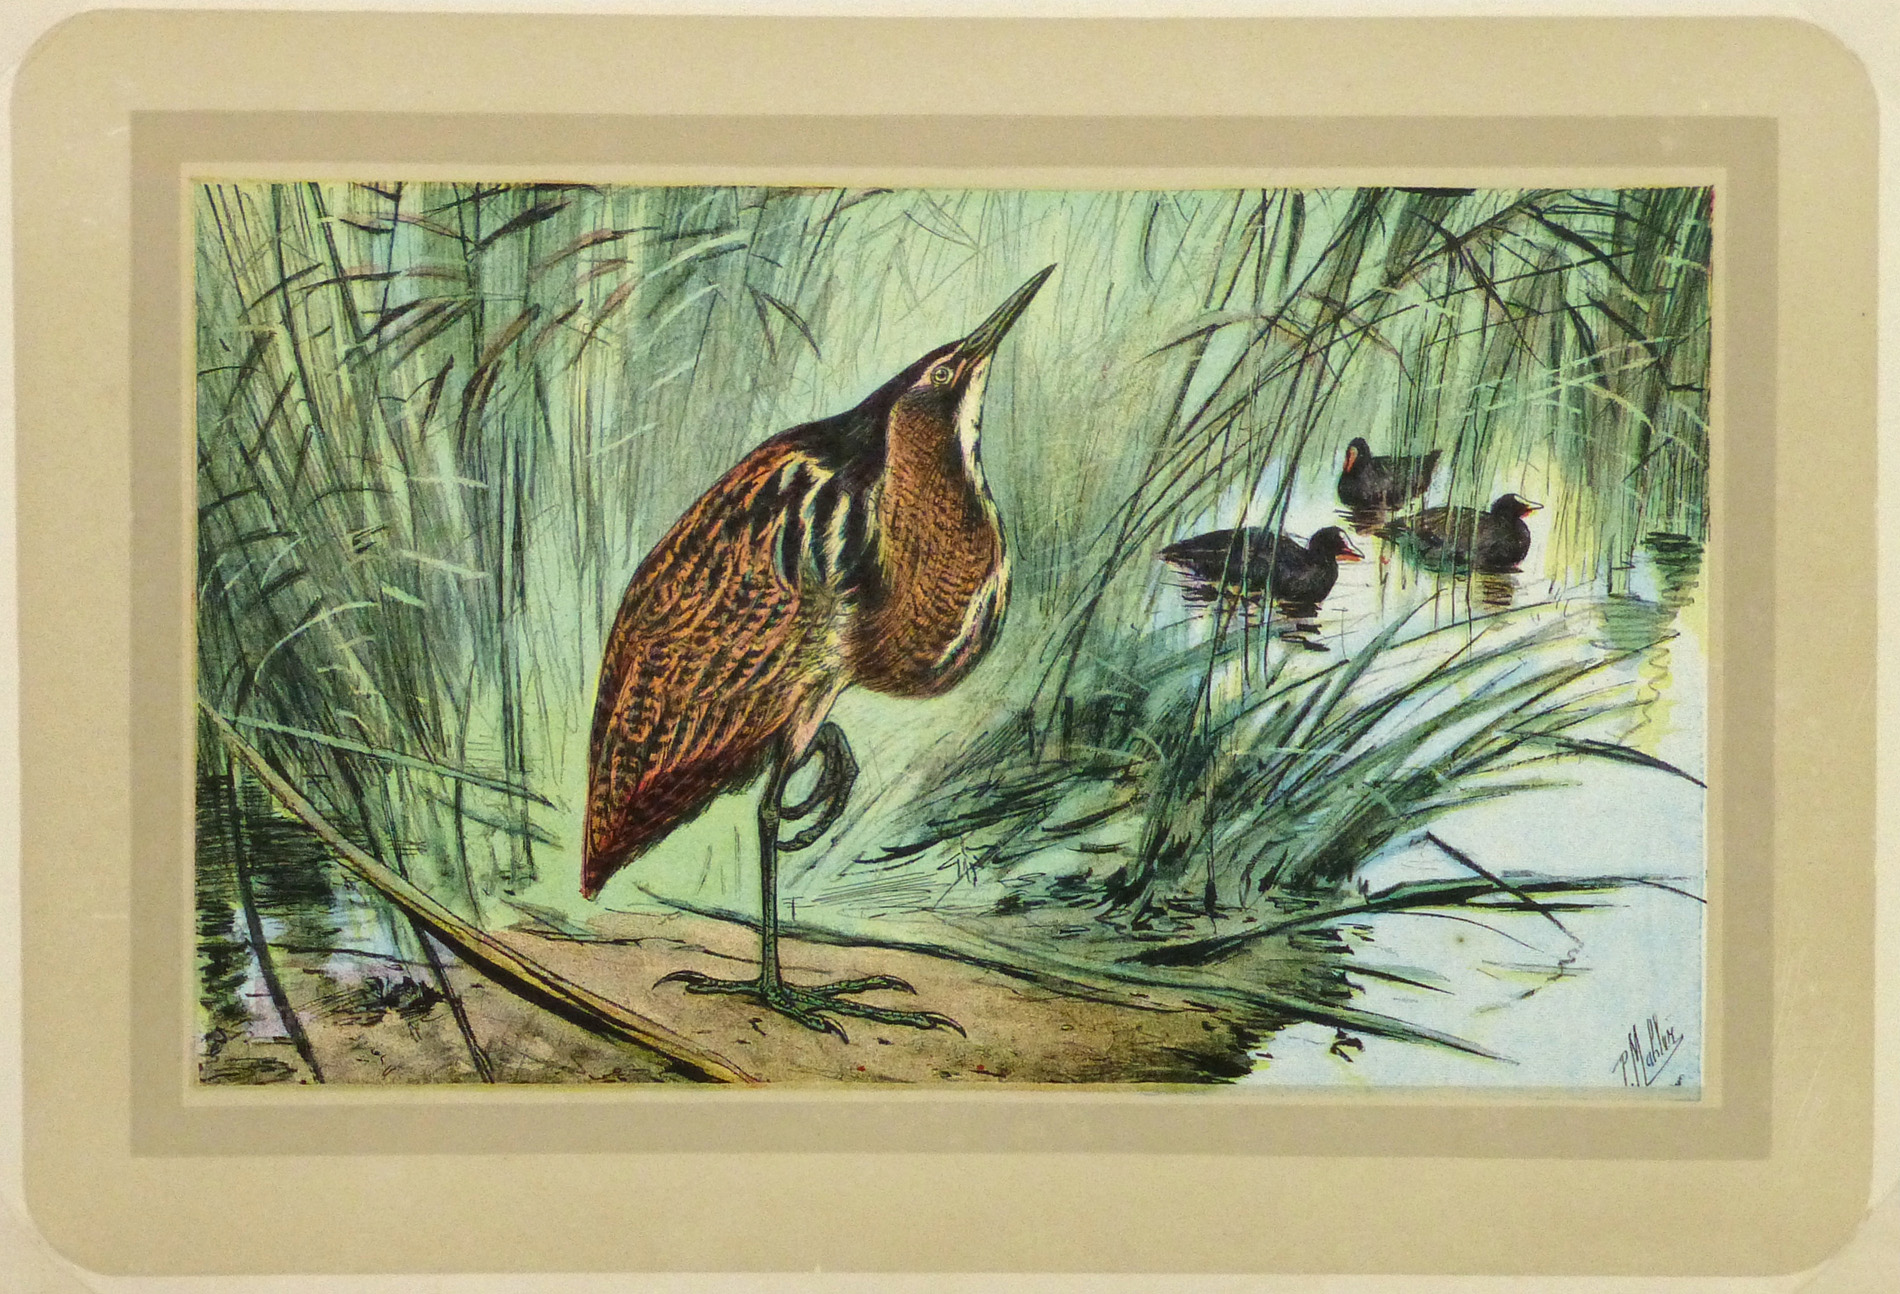 Bittern Wading Bird Lithograph-main-9217K